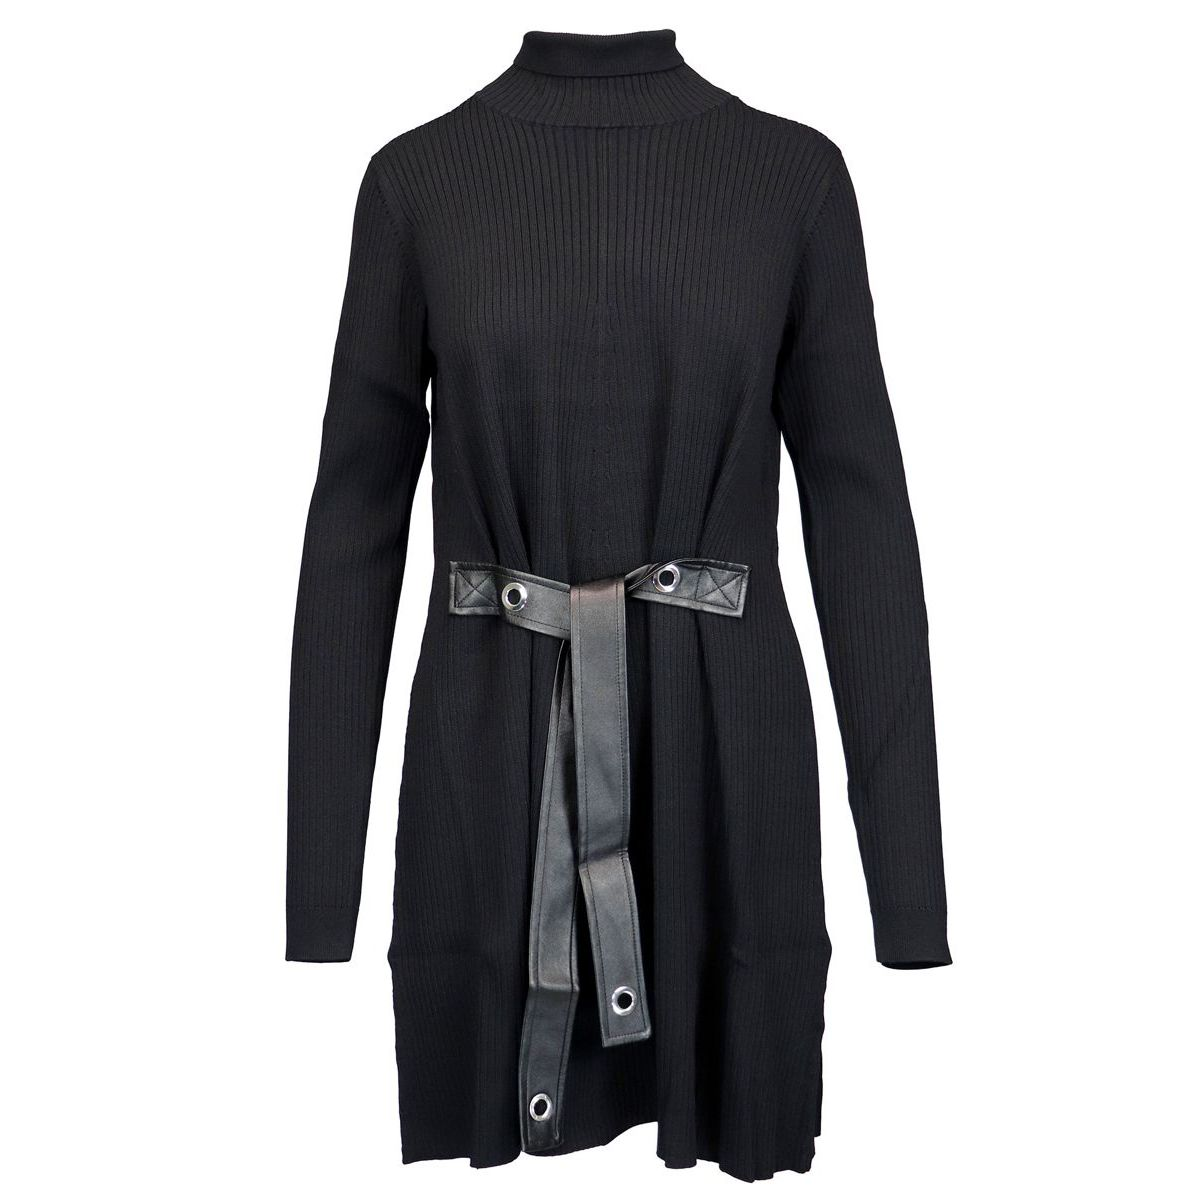 High-necked knit dress with belt Black Patrizia Pepe